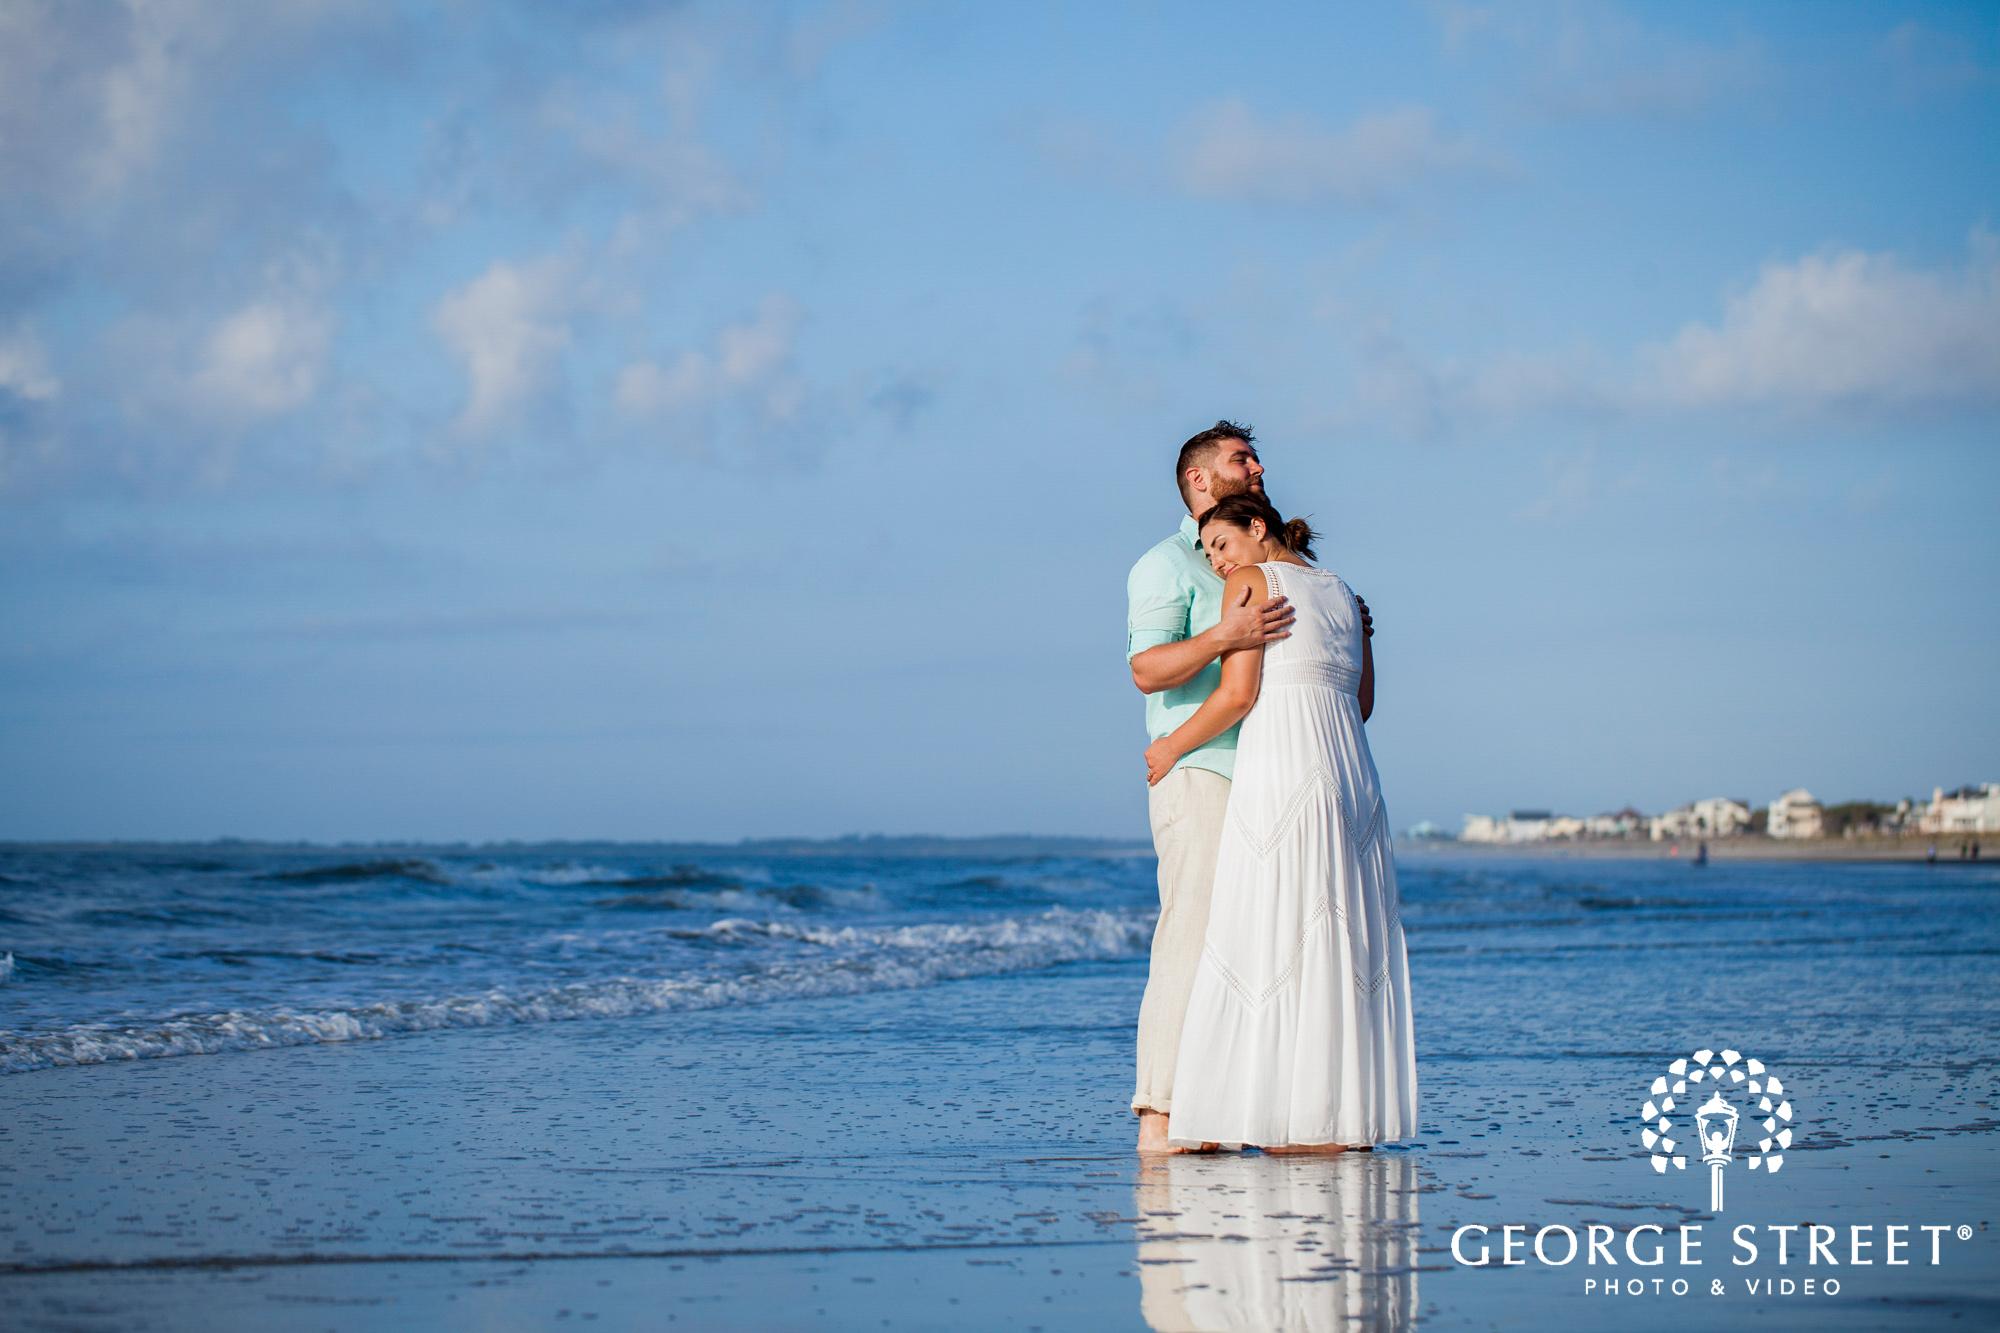 airy charleston beach engagement photo session 2